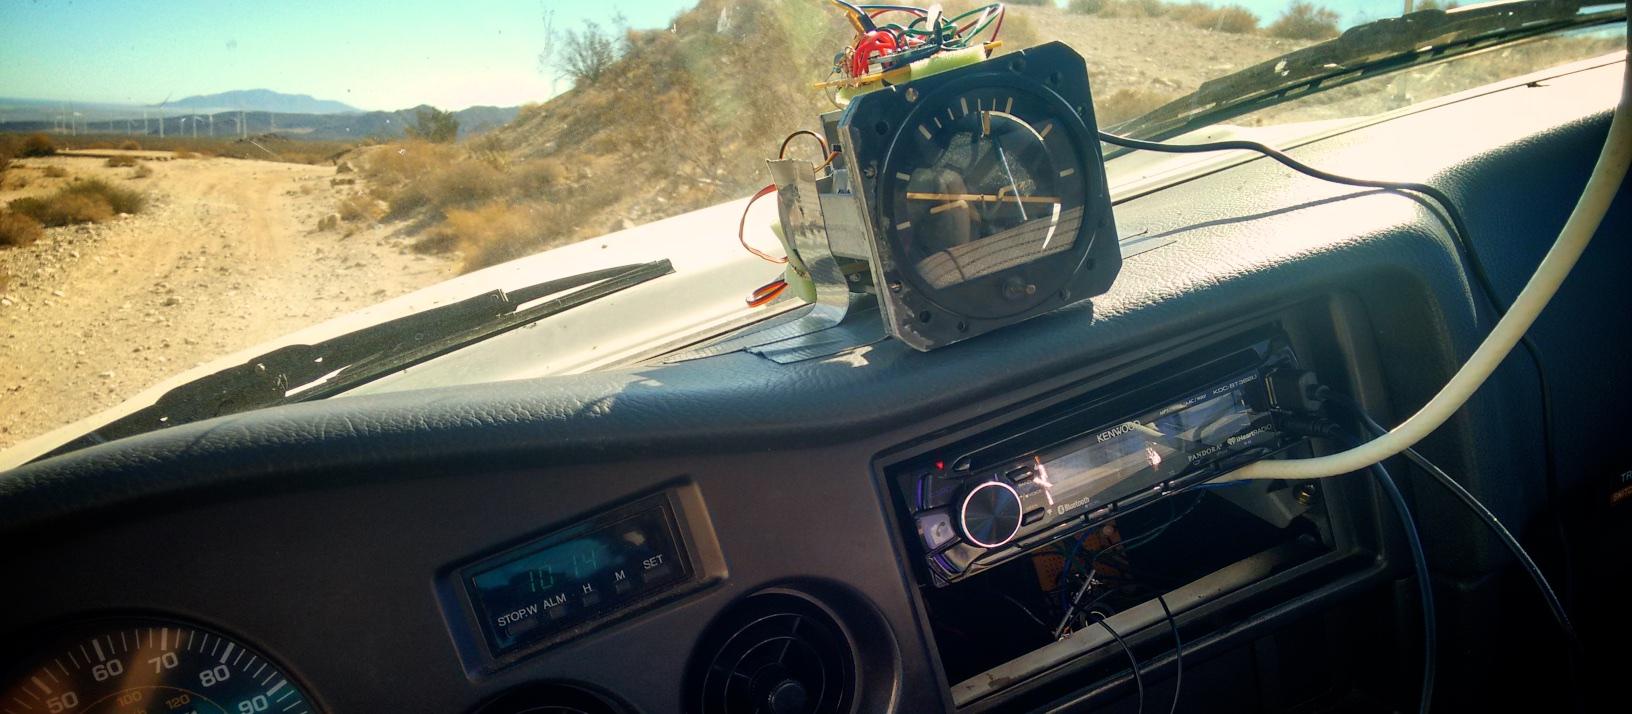 attitude-indicator-for-car 1